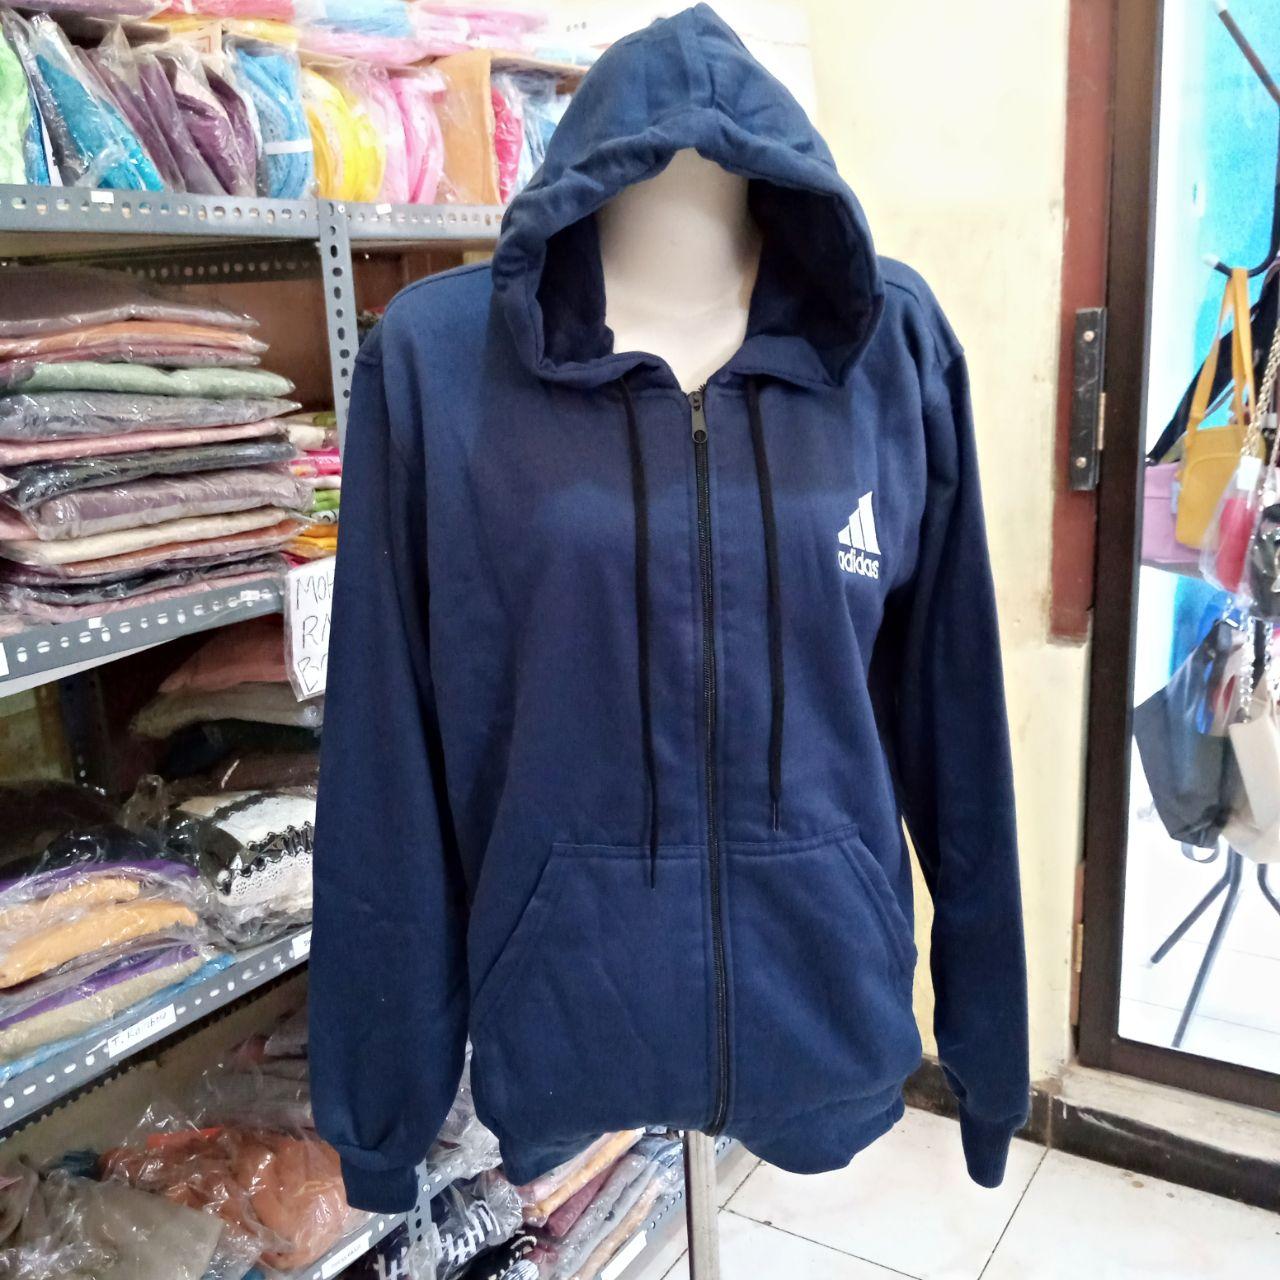 ini adalah Jaket Zipneo Navy, size: LD 90cm, Panjang 60cm, material: Fleece, color: Nevy, brand: jaketindonesia, age_group: all ages, gender: unisex